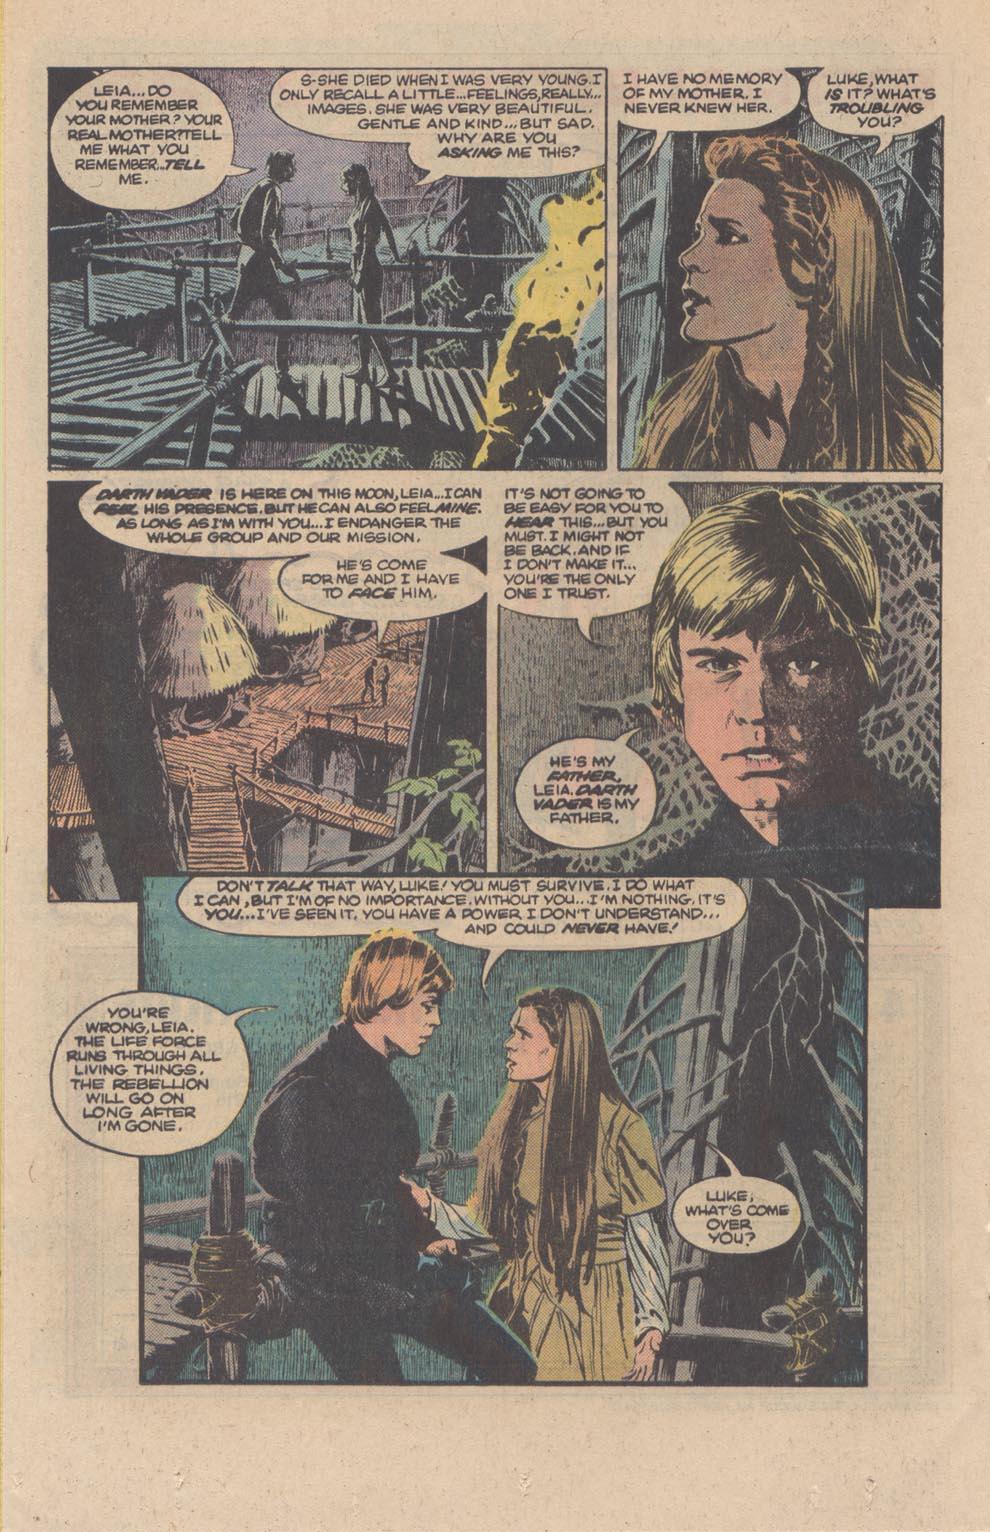 Read online Star Wars: Return of the Jedi comic -  Issue #3 - 18